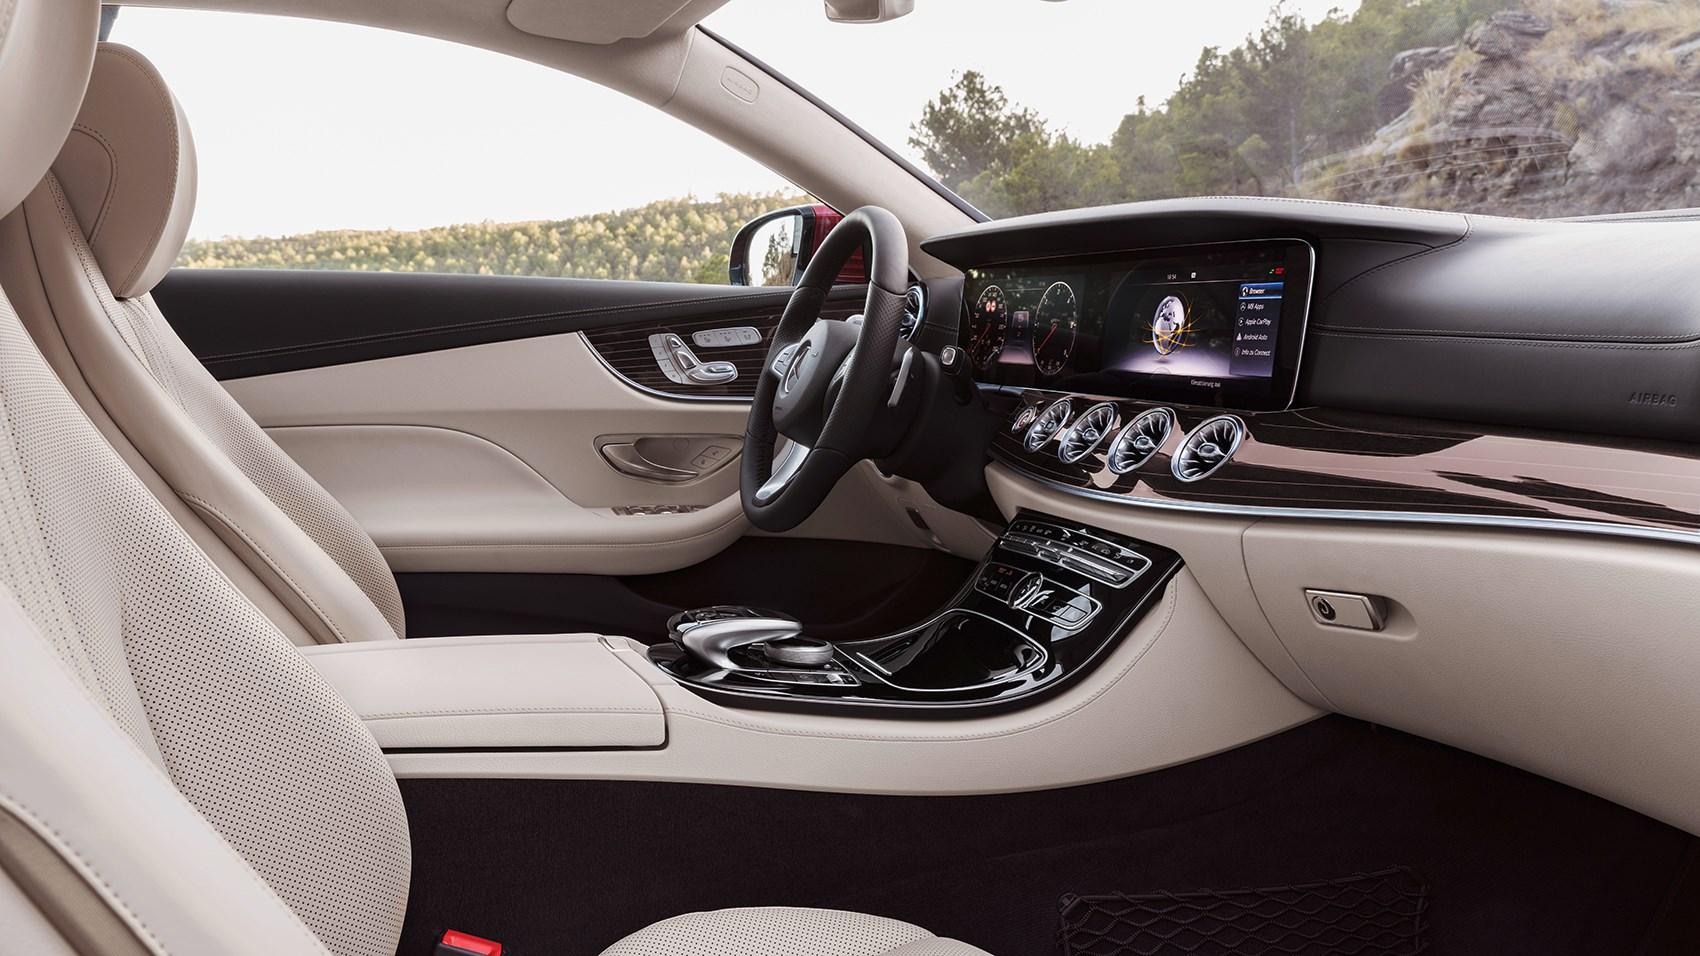 Mercedes E Cl Coupe